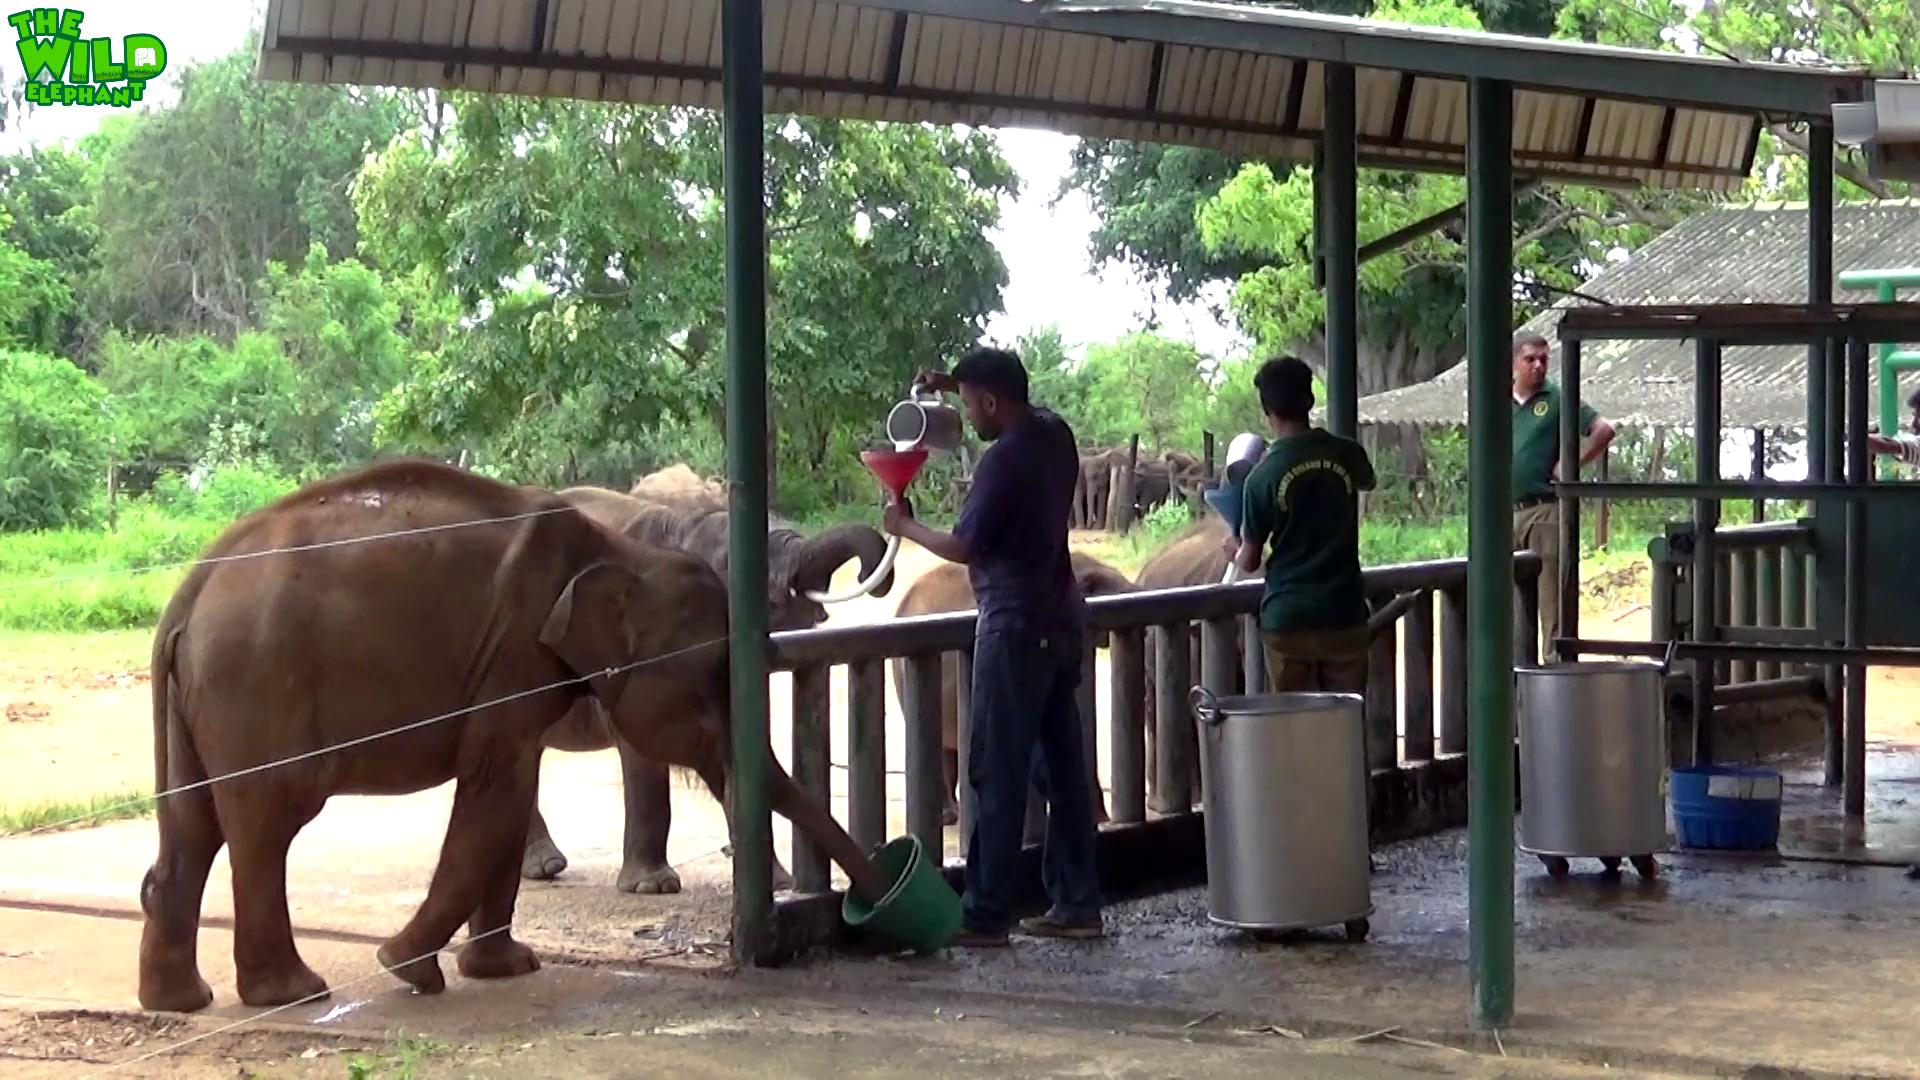 Feeding Milk to Cute Baby Elephants